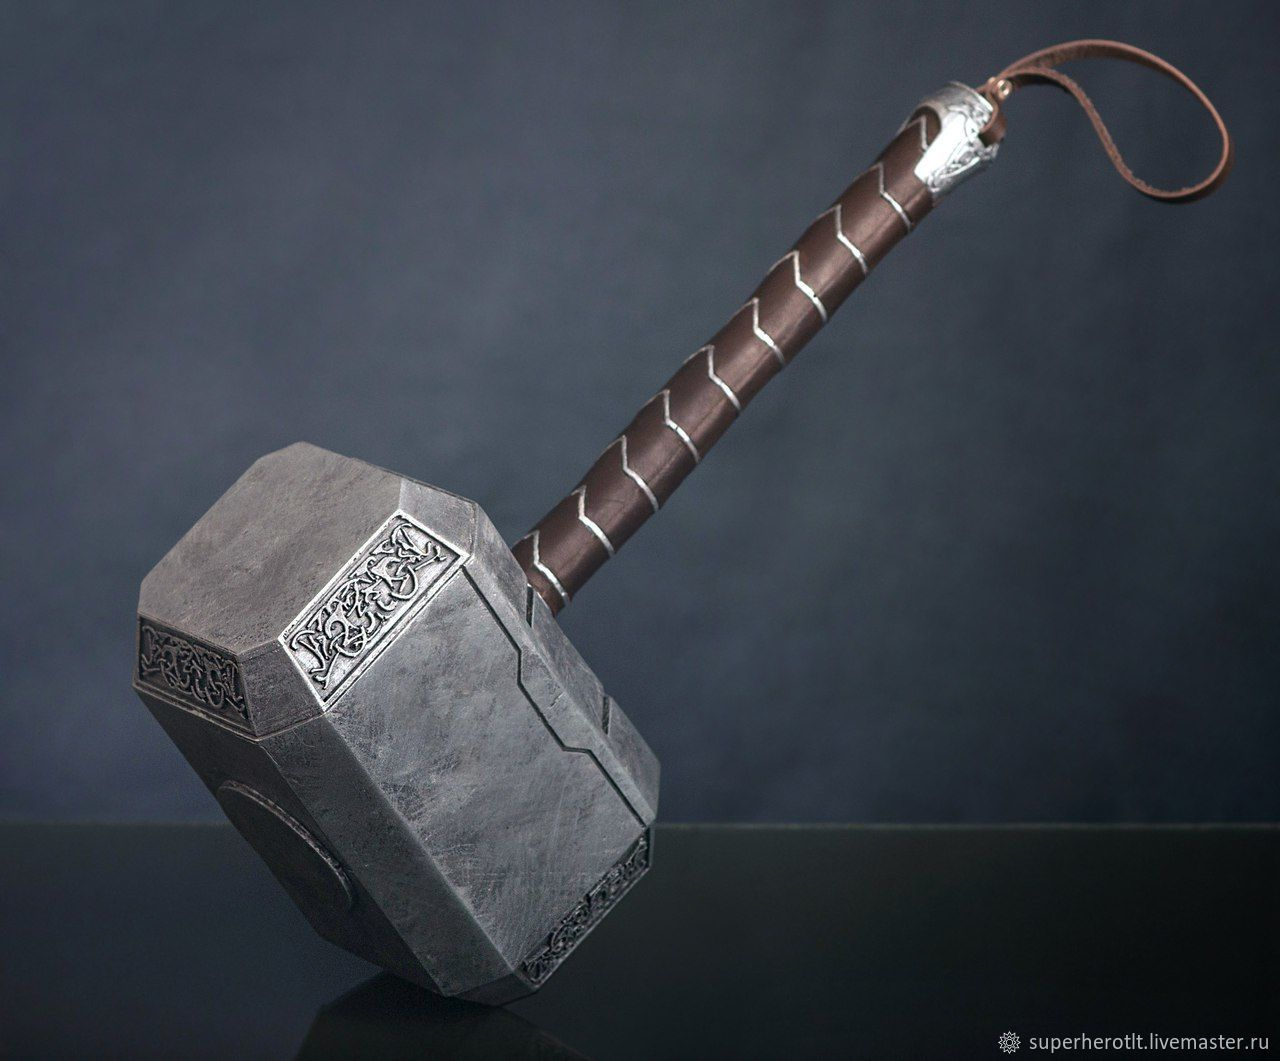 mjollnir hammer of thor marvel thor 3 ragnarok shop online on livemaster with shipping